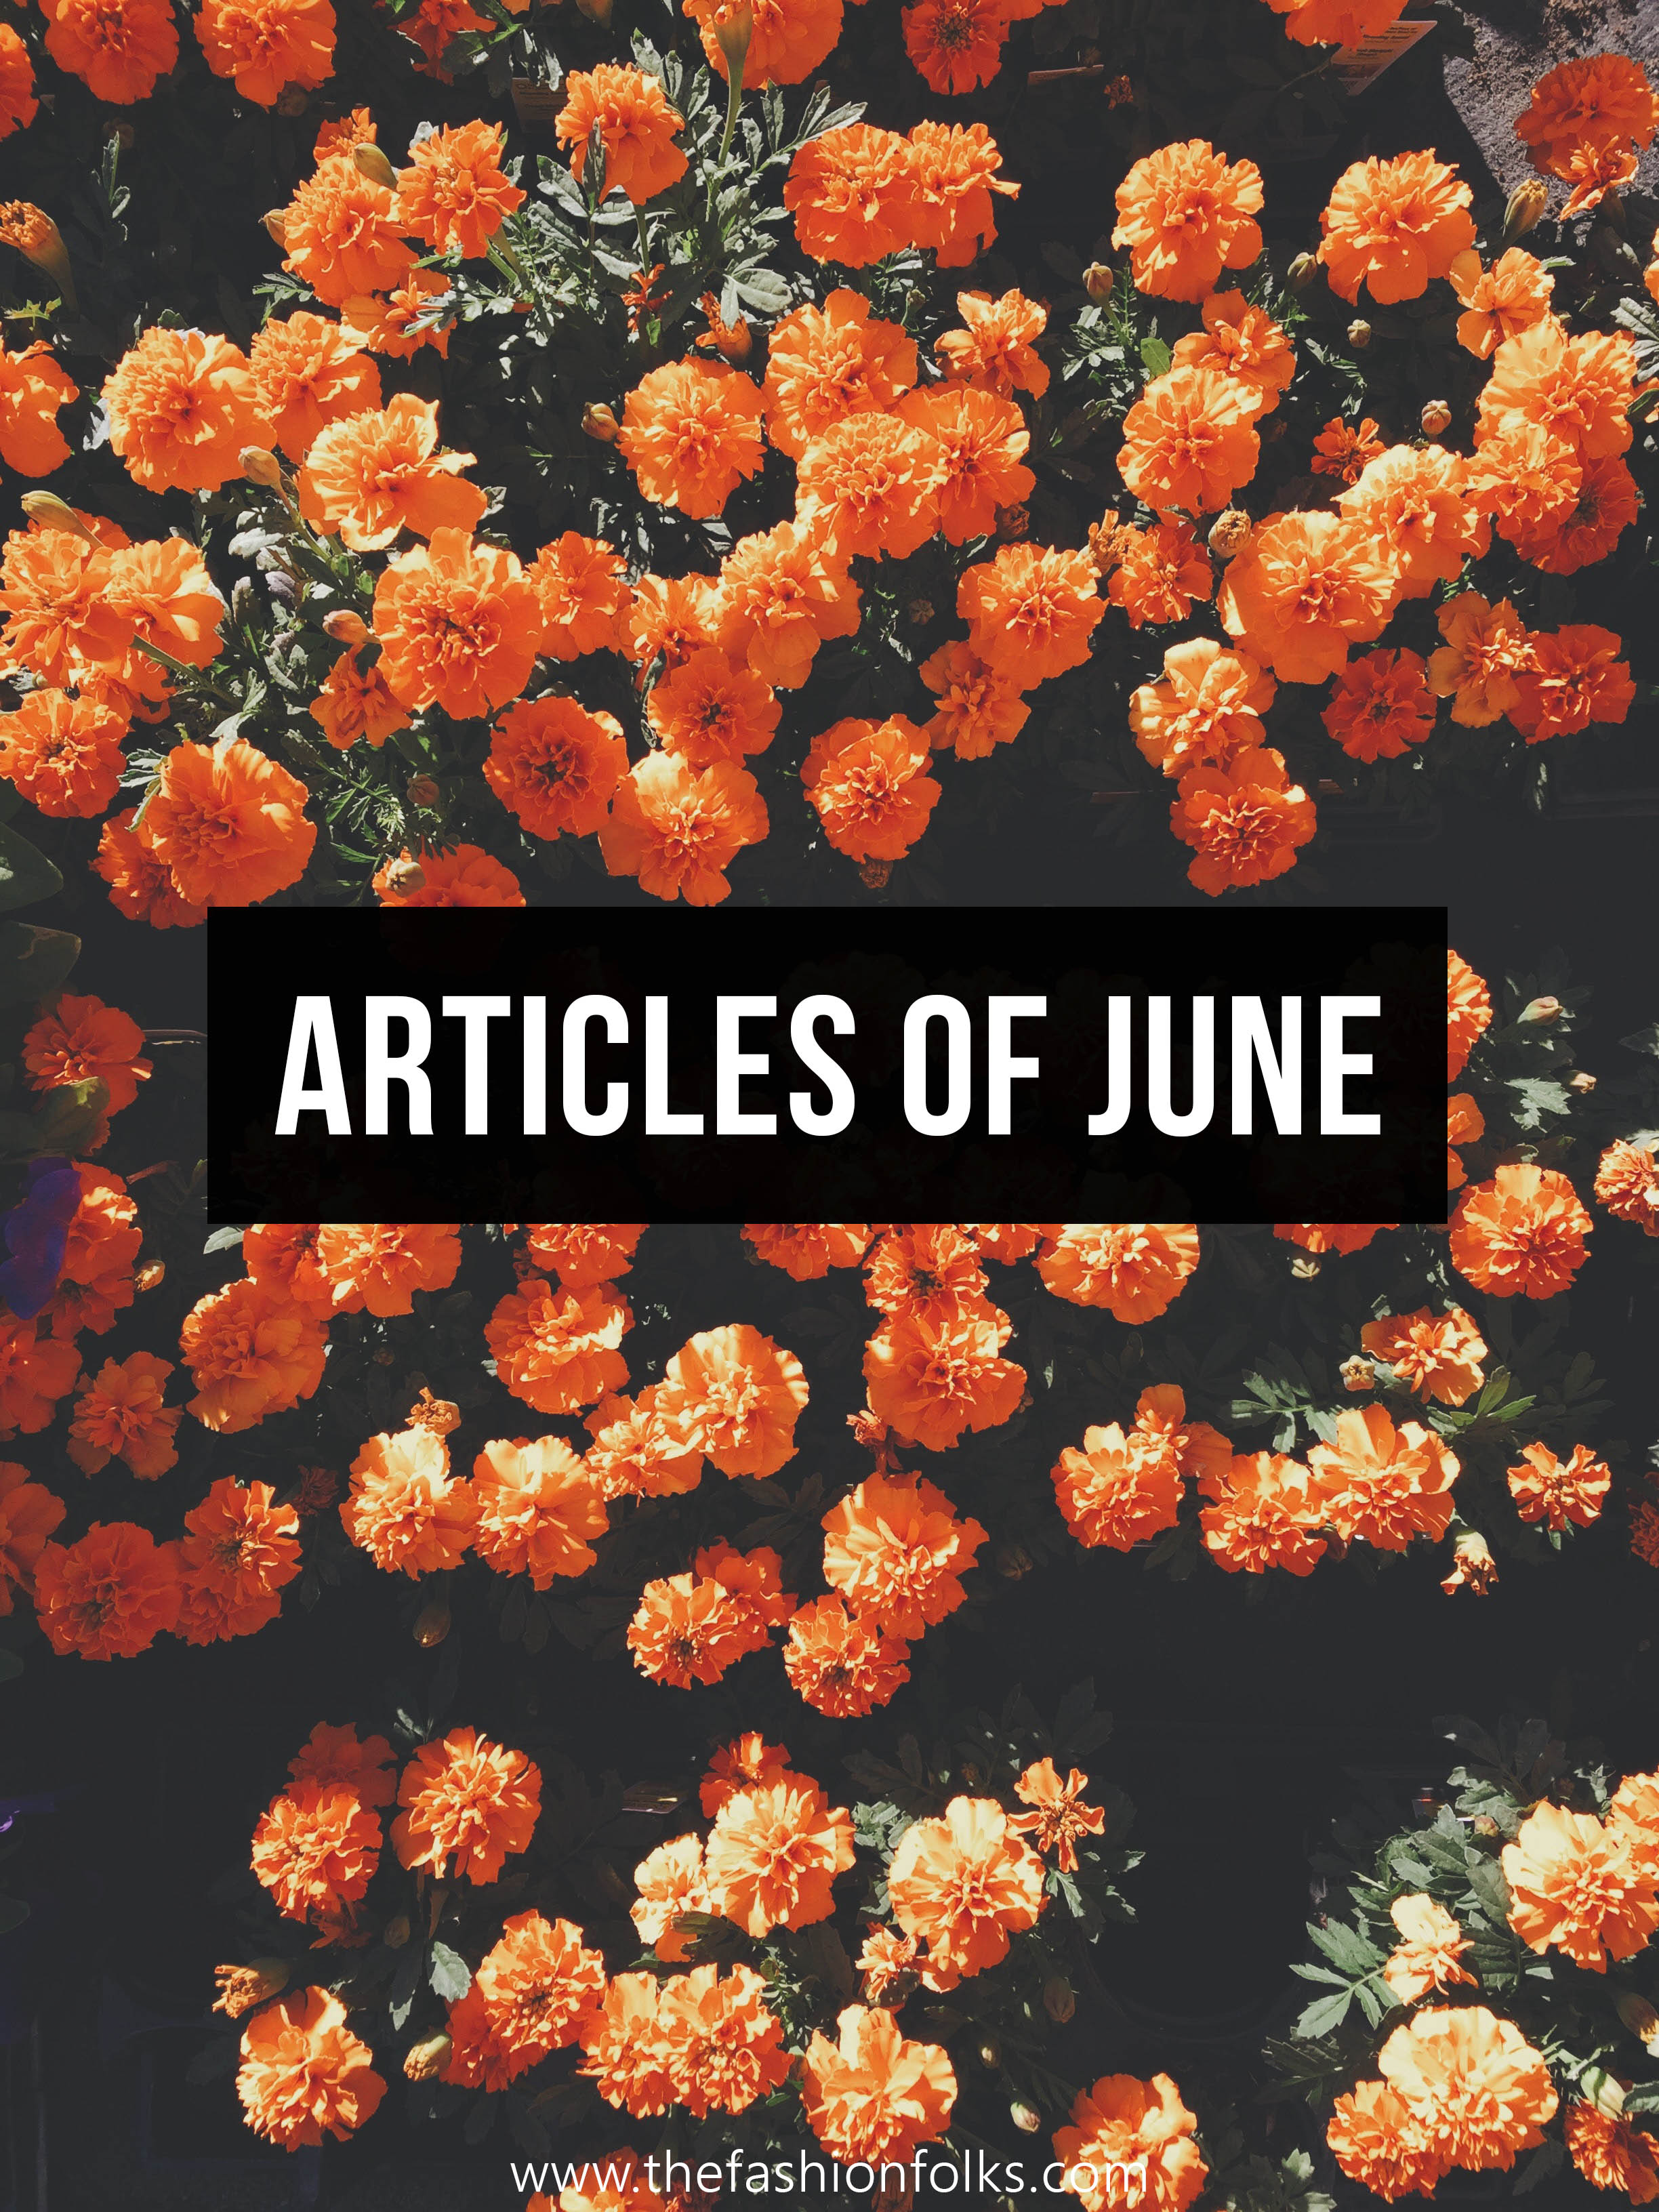 Articles of June 2018